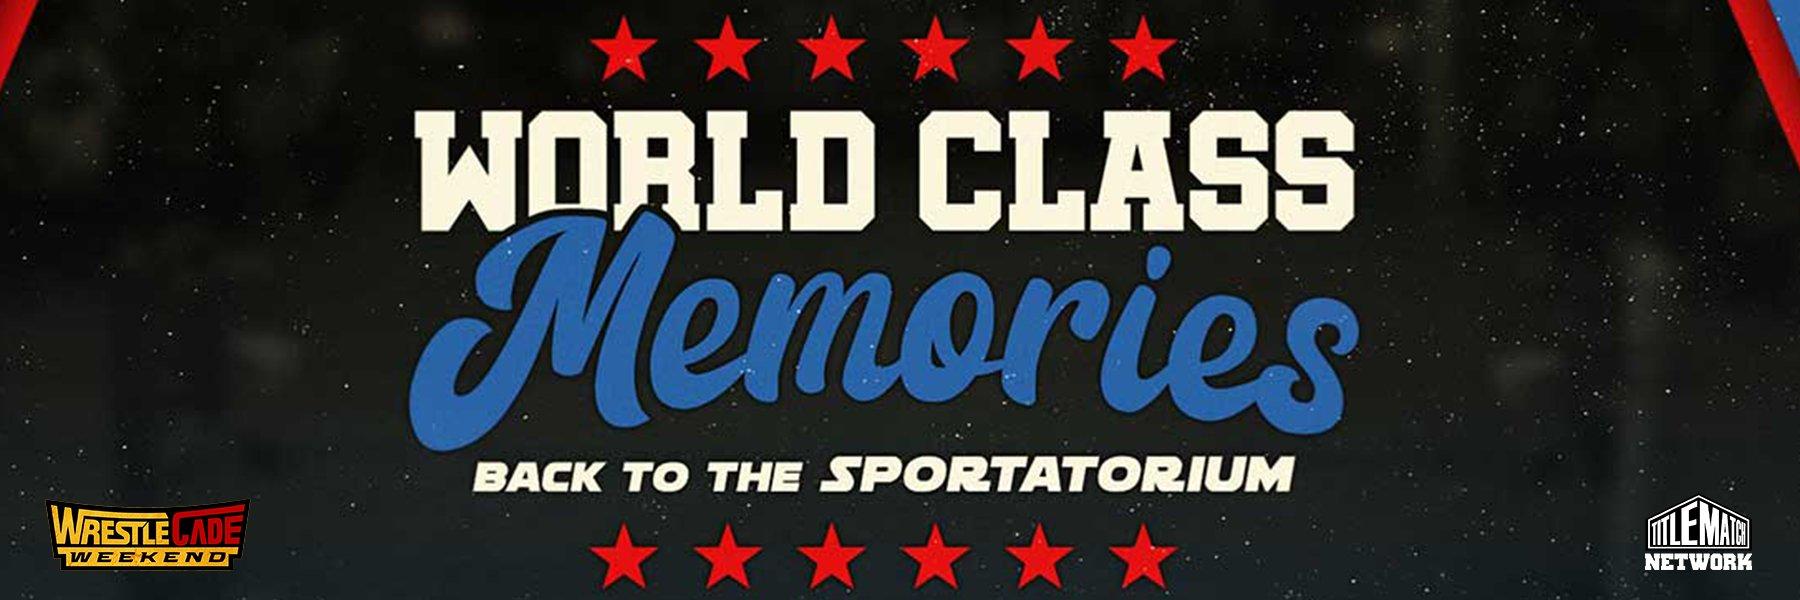 WCCW: World Classic Championship Wrestling - Back to the Sportatorium!